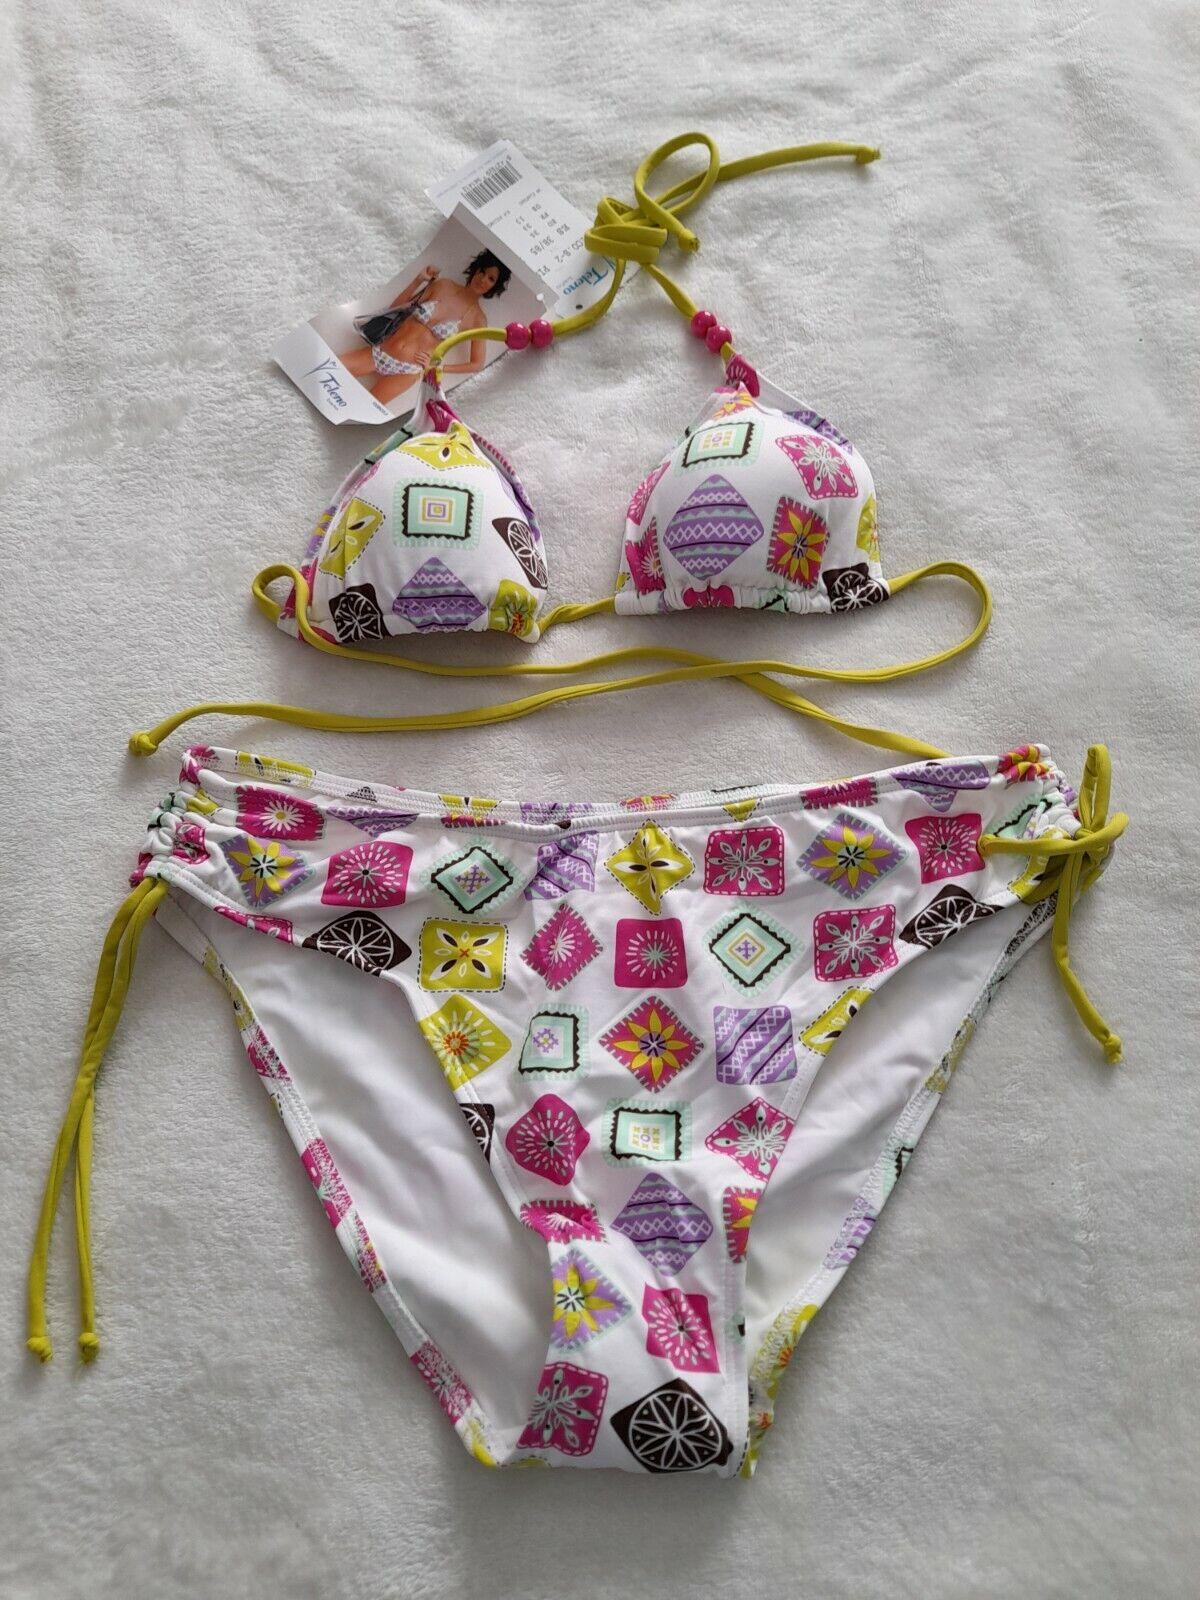 Teleno Damen Triangel Bikini Weiss Bunt Größe 36 B Cup Hub27